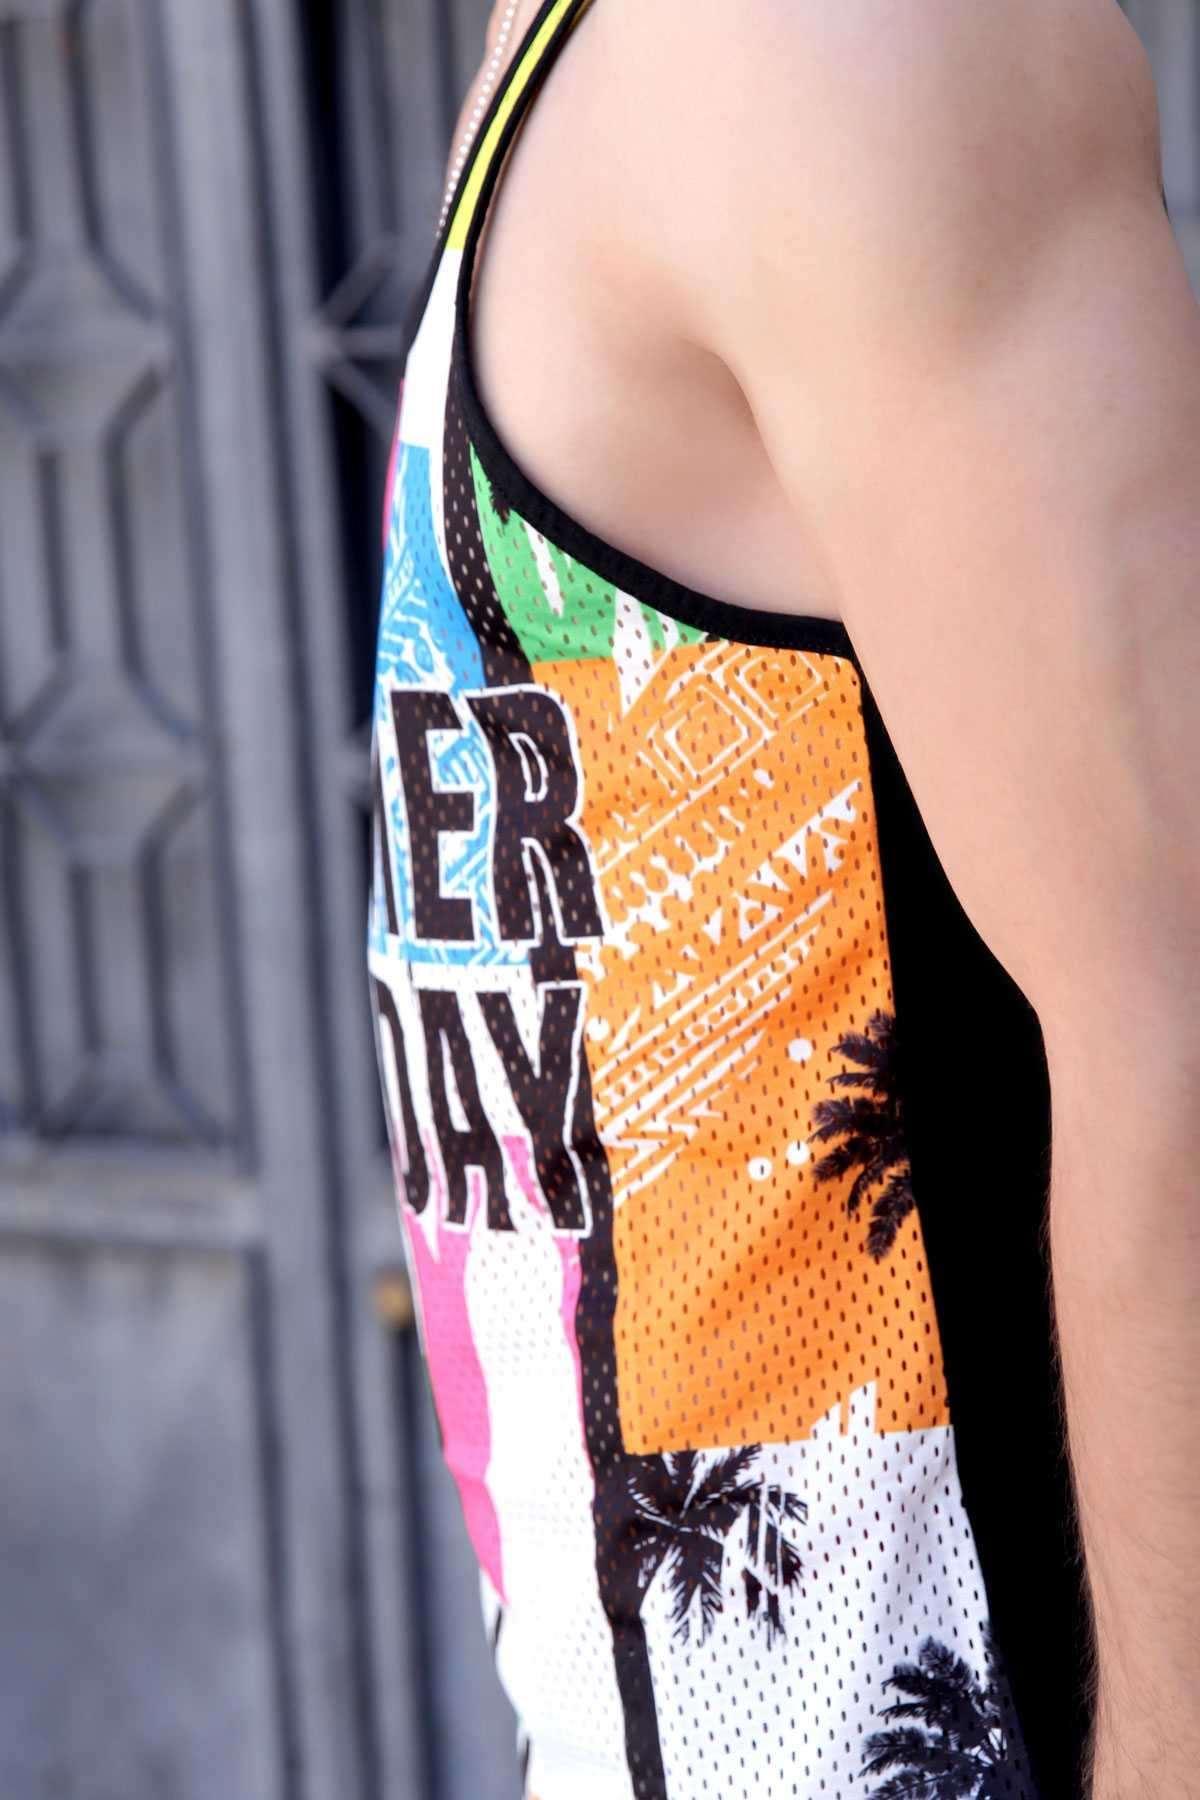 Önü Summer Holiday Yazılı Renkli Fileli Atlet Siyah